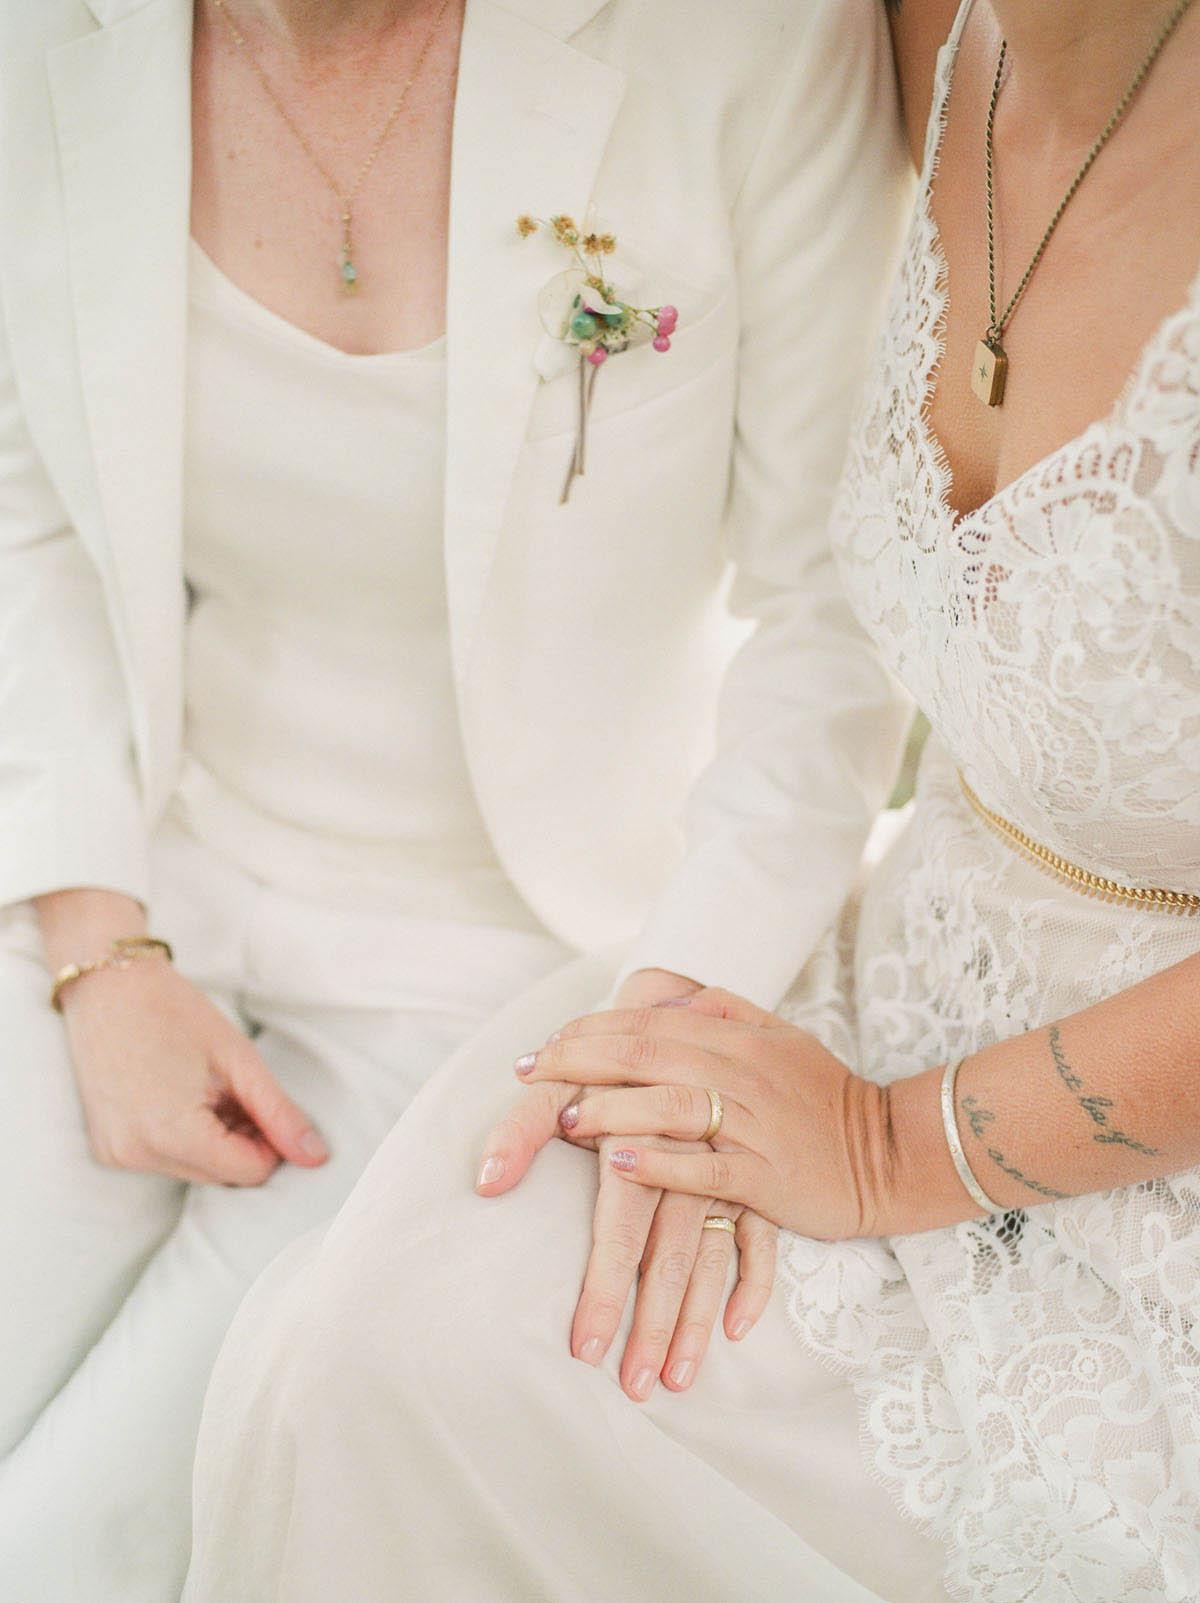 35-pant-suit-wedding-attire.jpg